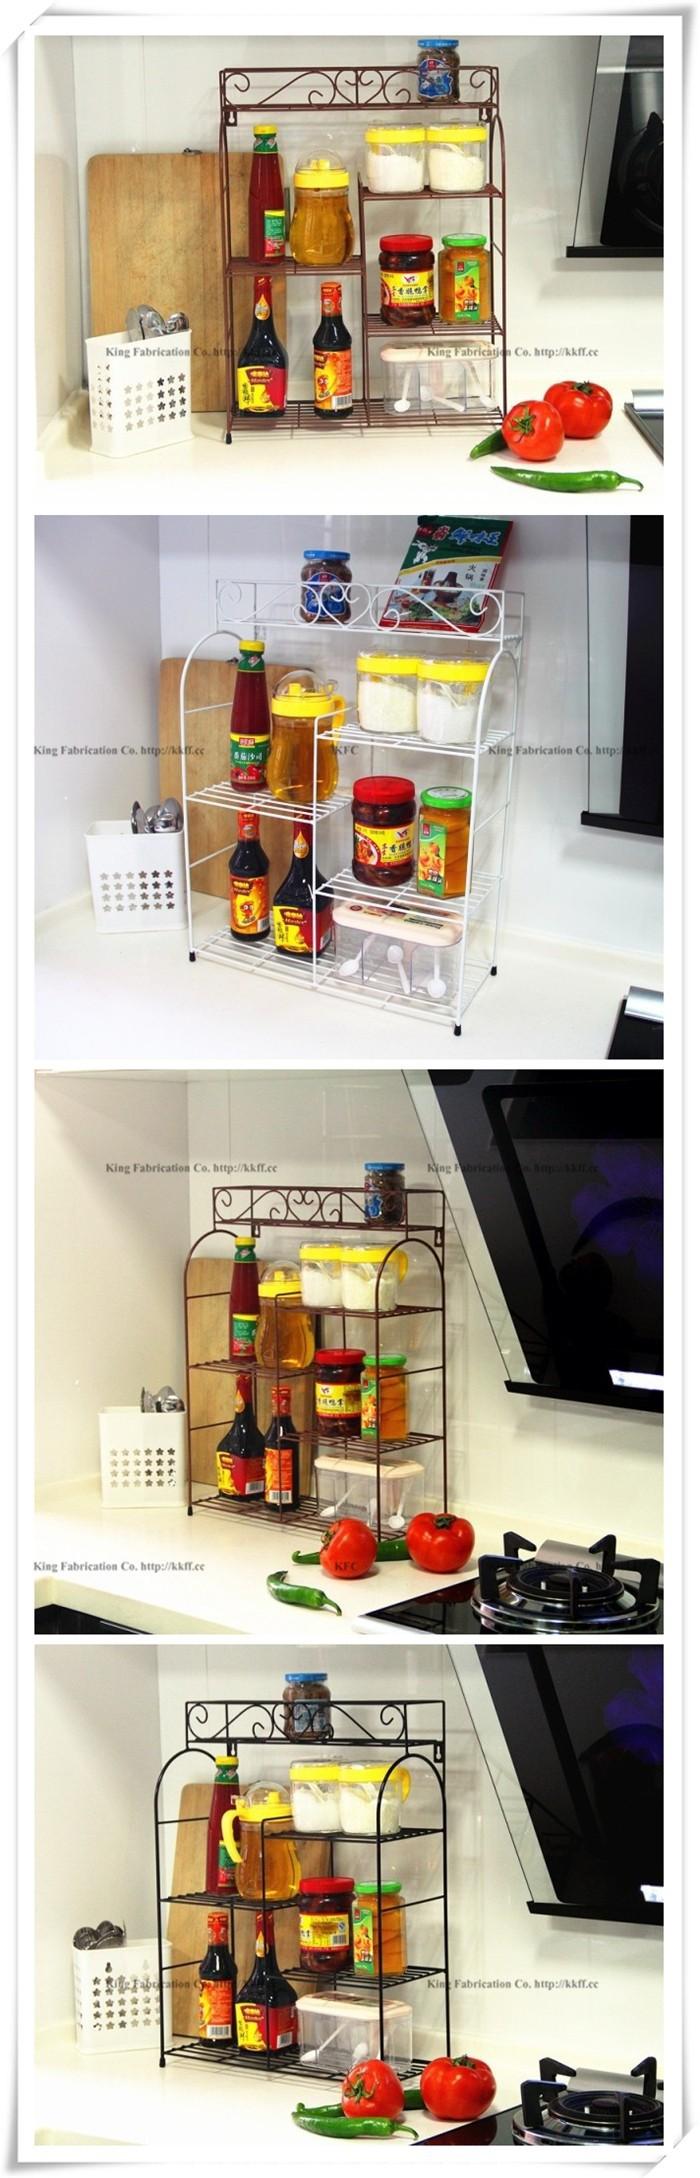 Buy European-style wrought iron kitchen shelf storage rack wall mounted kitchen knife kitchen Spice rack cheap